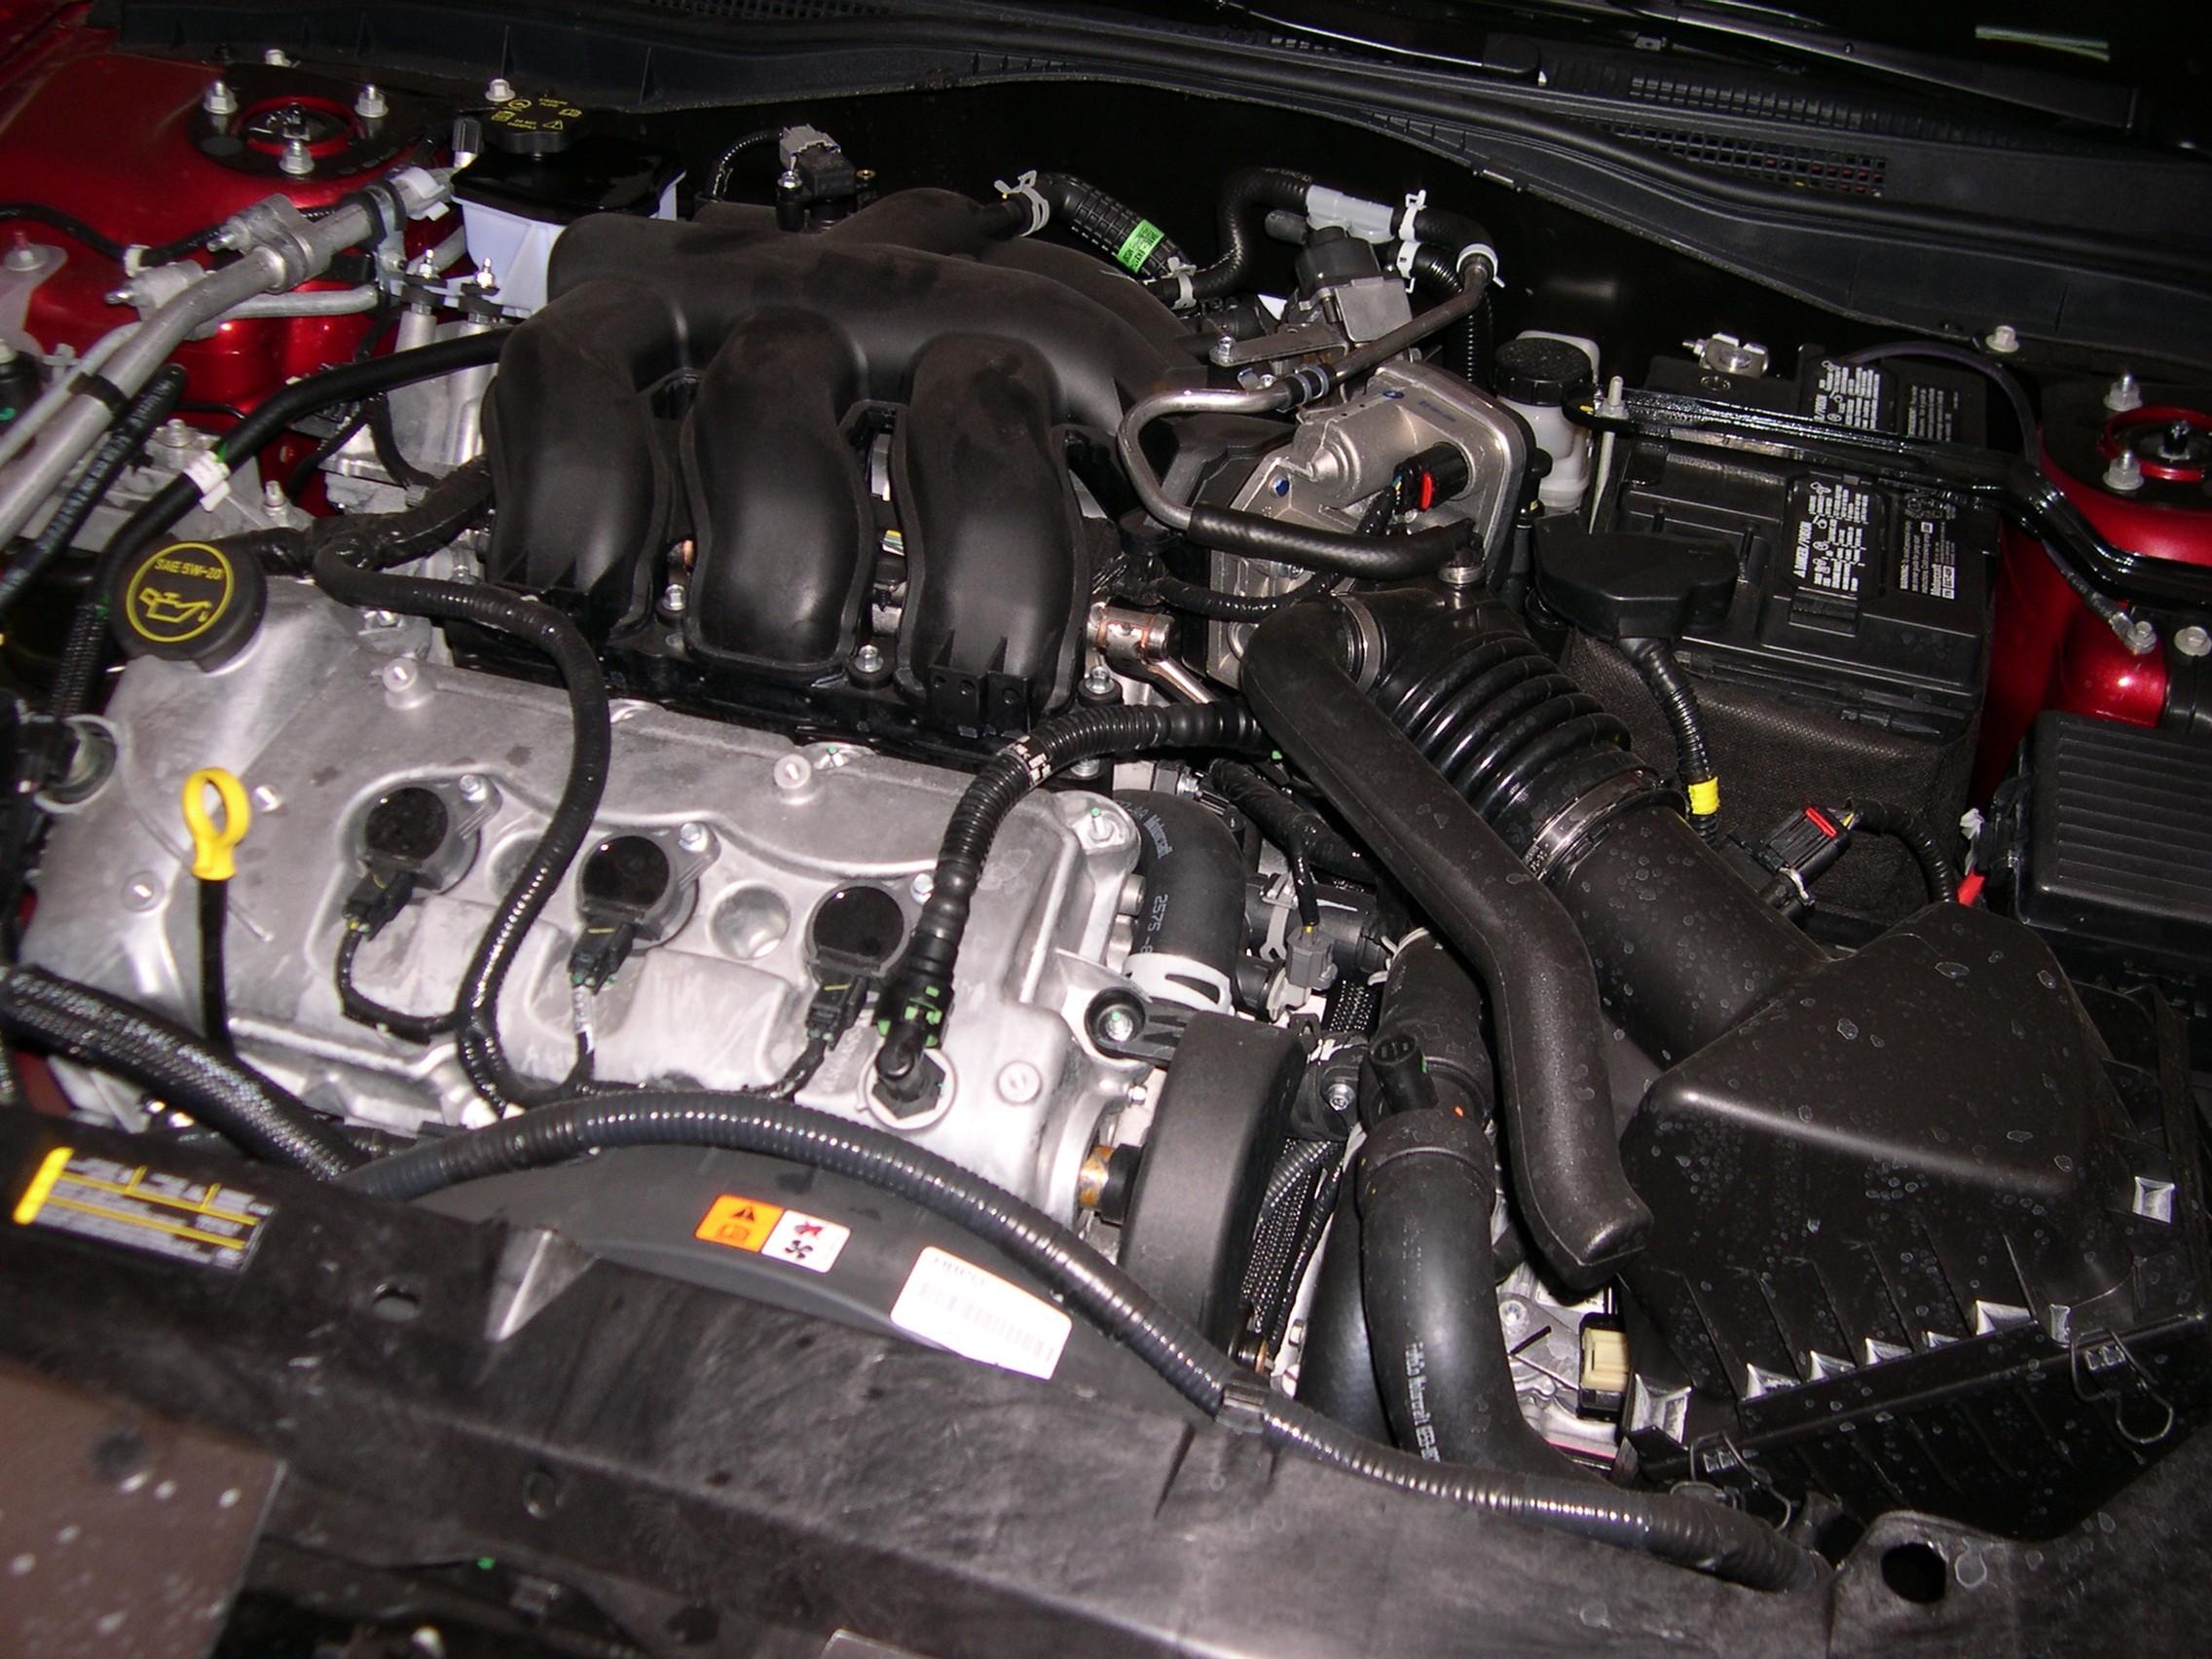 2004 Mazda 3 0 V6 Engine Diagram - 14.4.danishfashion-mode.de • on ford ranger electrical diagram, ford ranger parts diagram, ford ranger audio, ford ranger trailer wiring harness, ford ranger speaker wire colors, ford ranger 60 40 seats, ford ranger fuse box diagram,